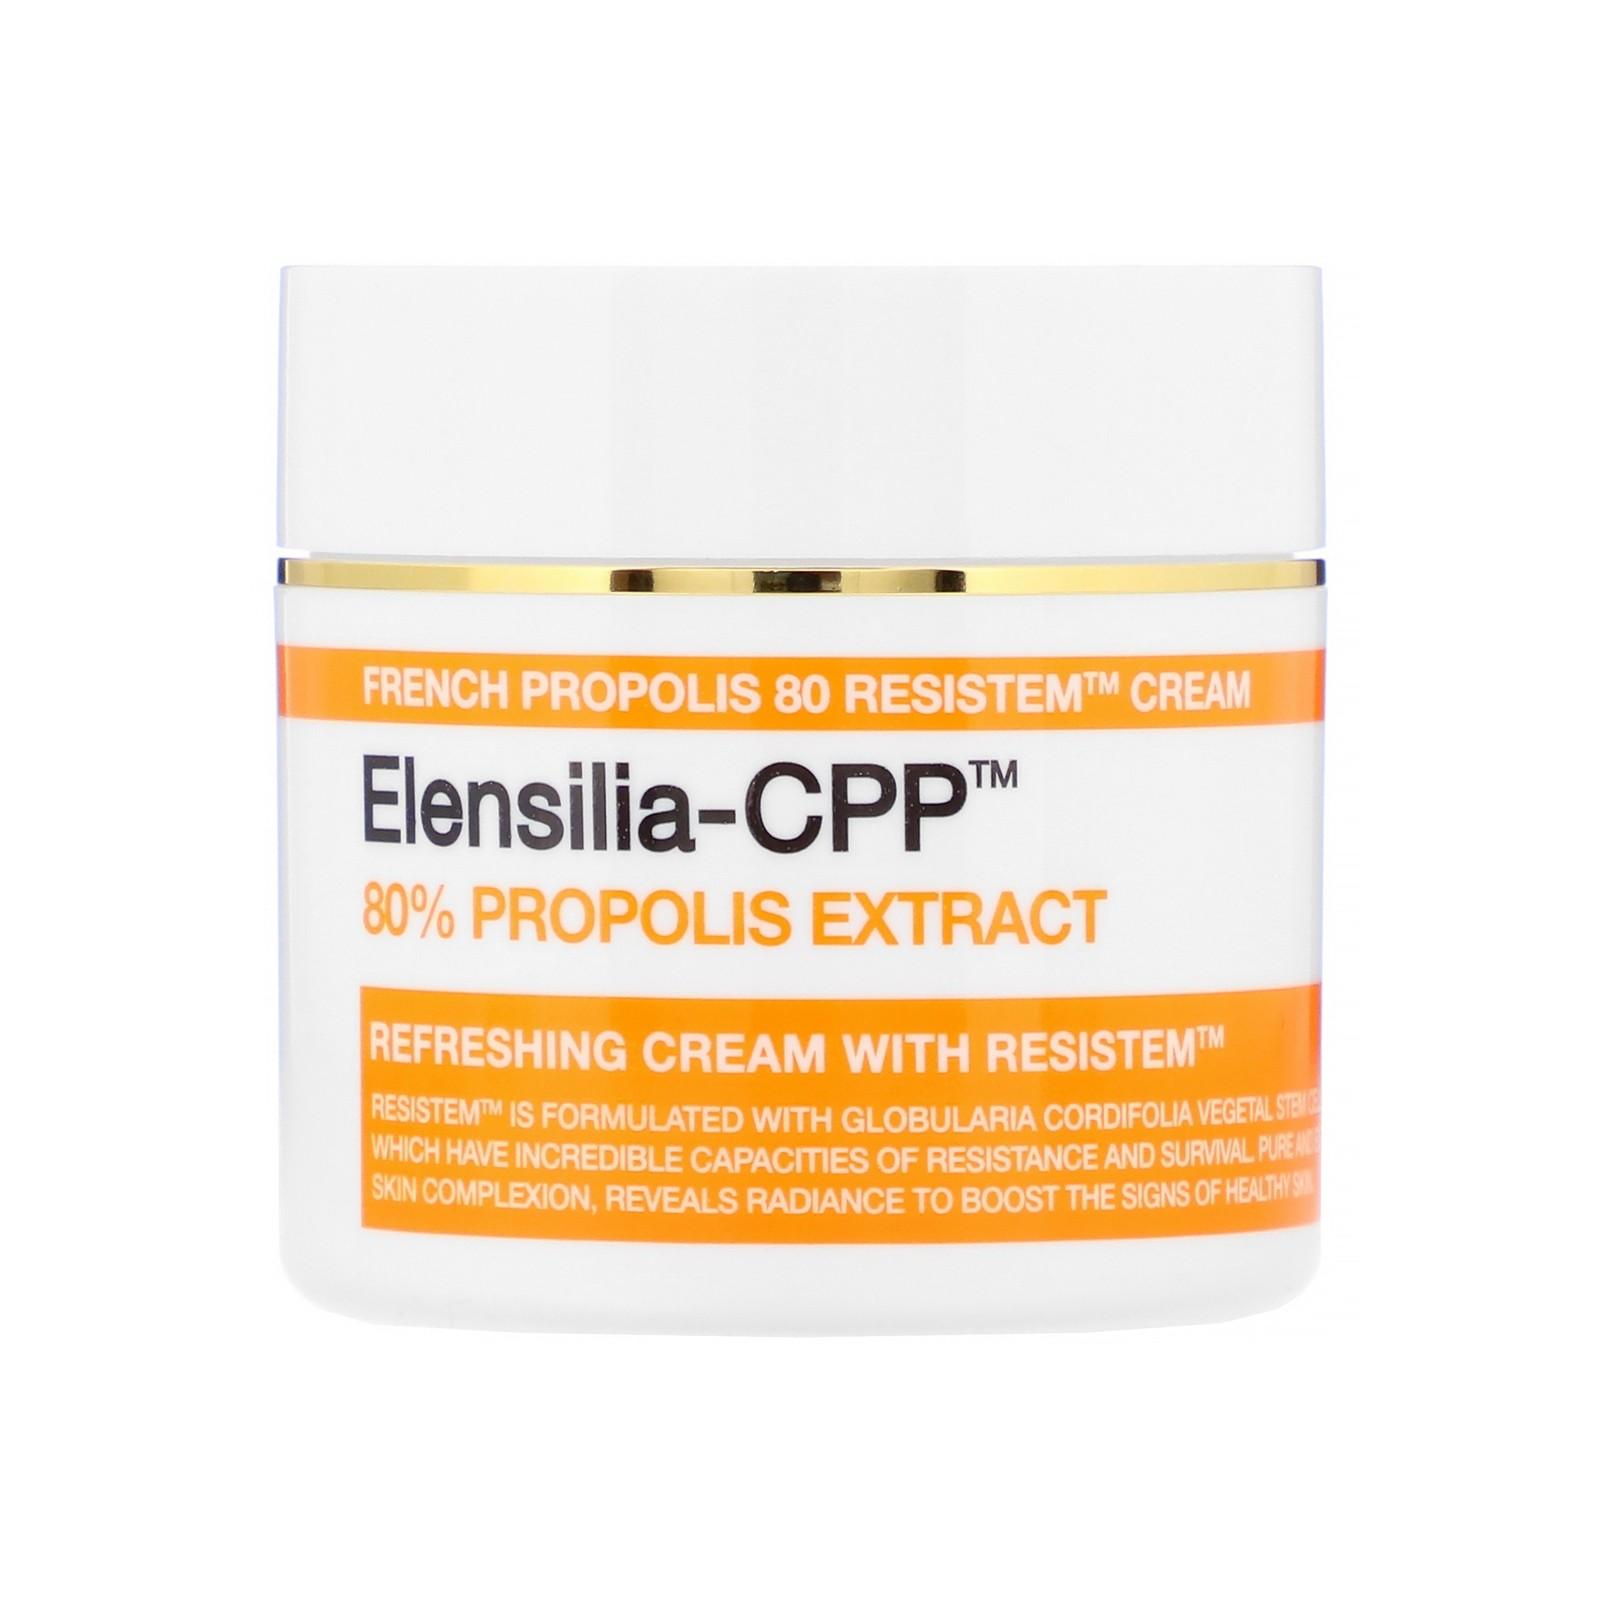 [Elensilia] CPP, French Propolis 80 Resistem Cream